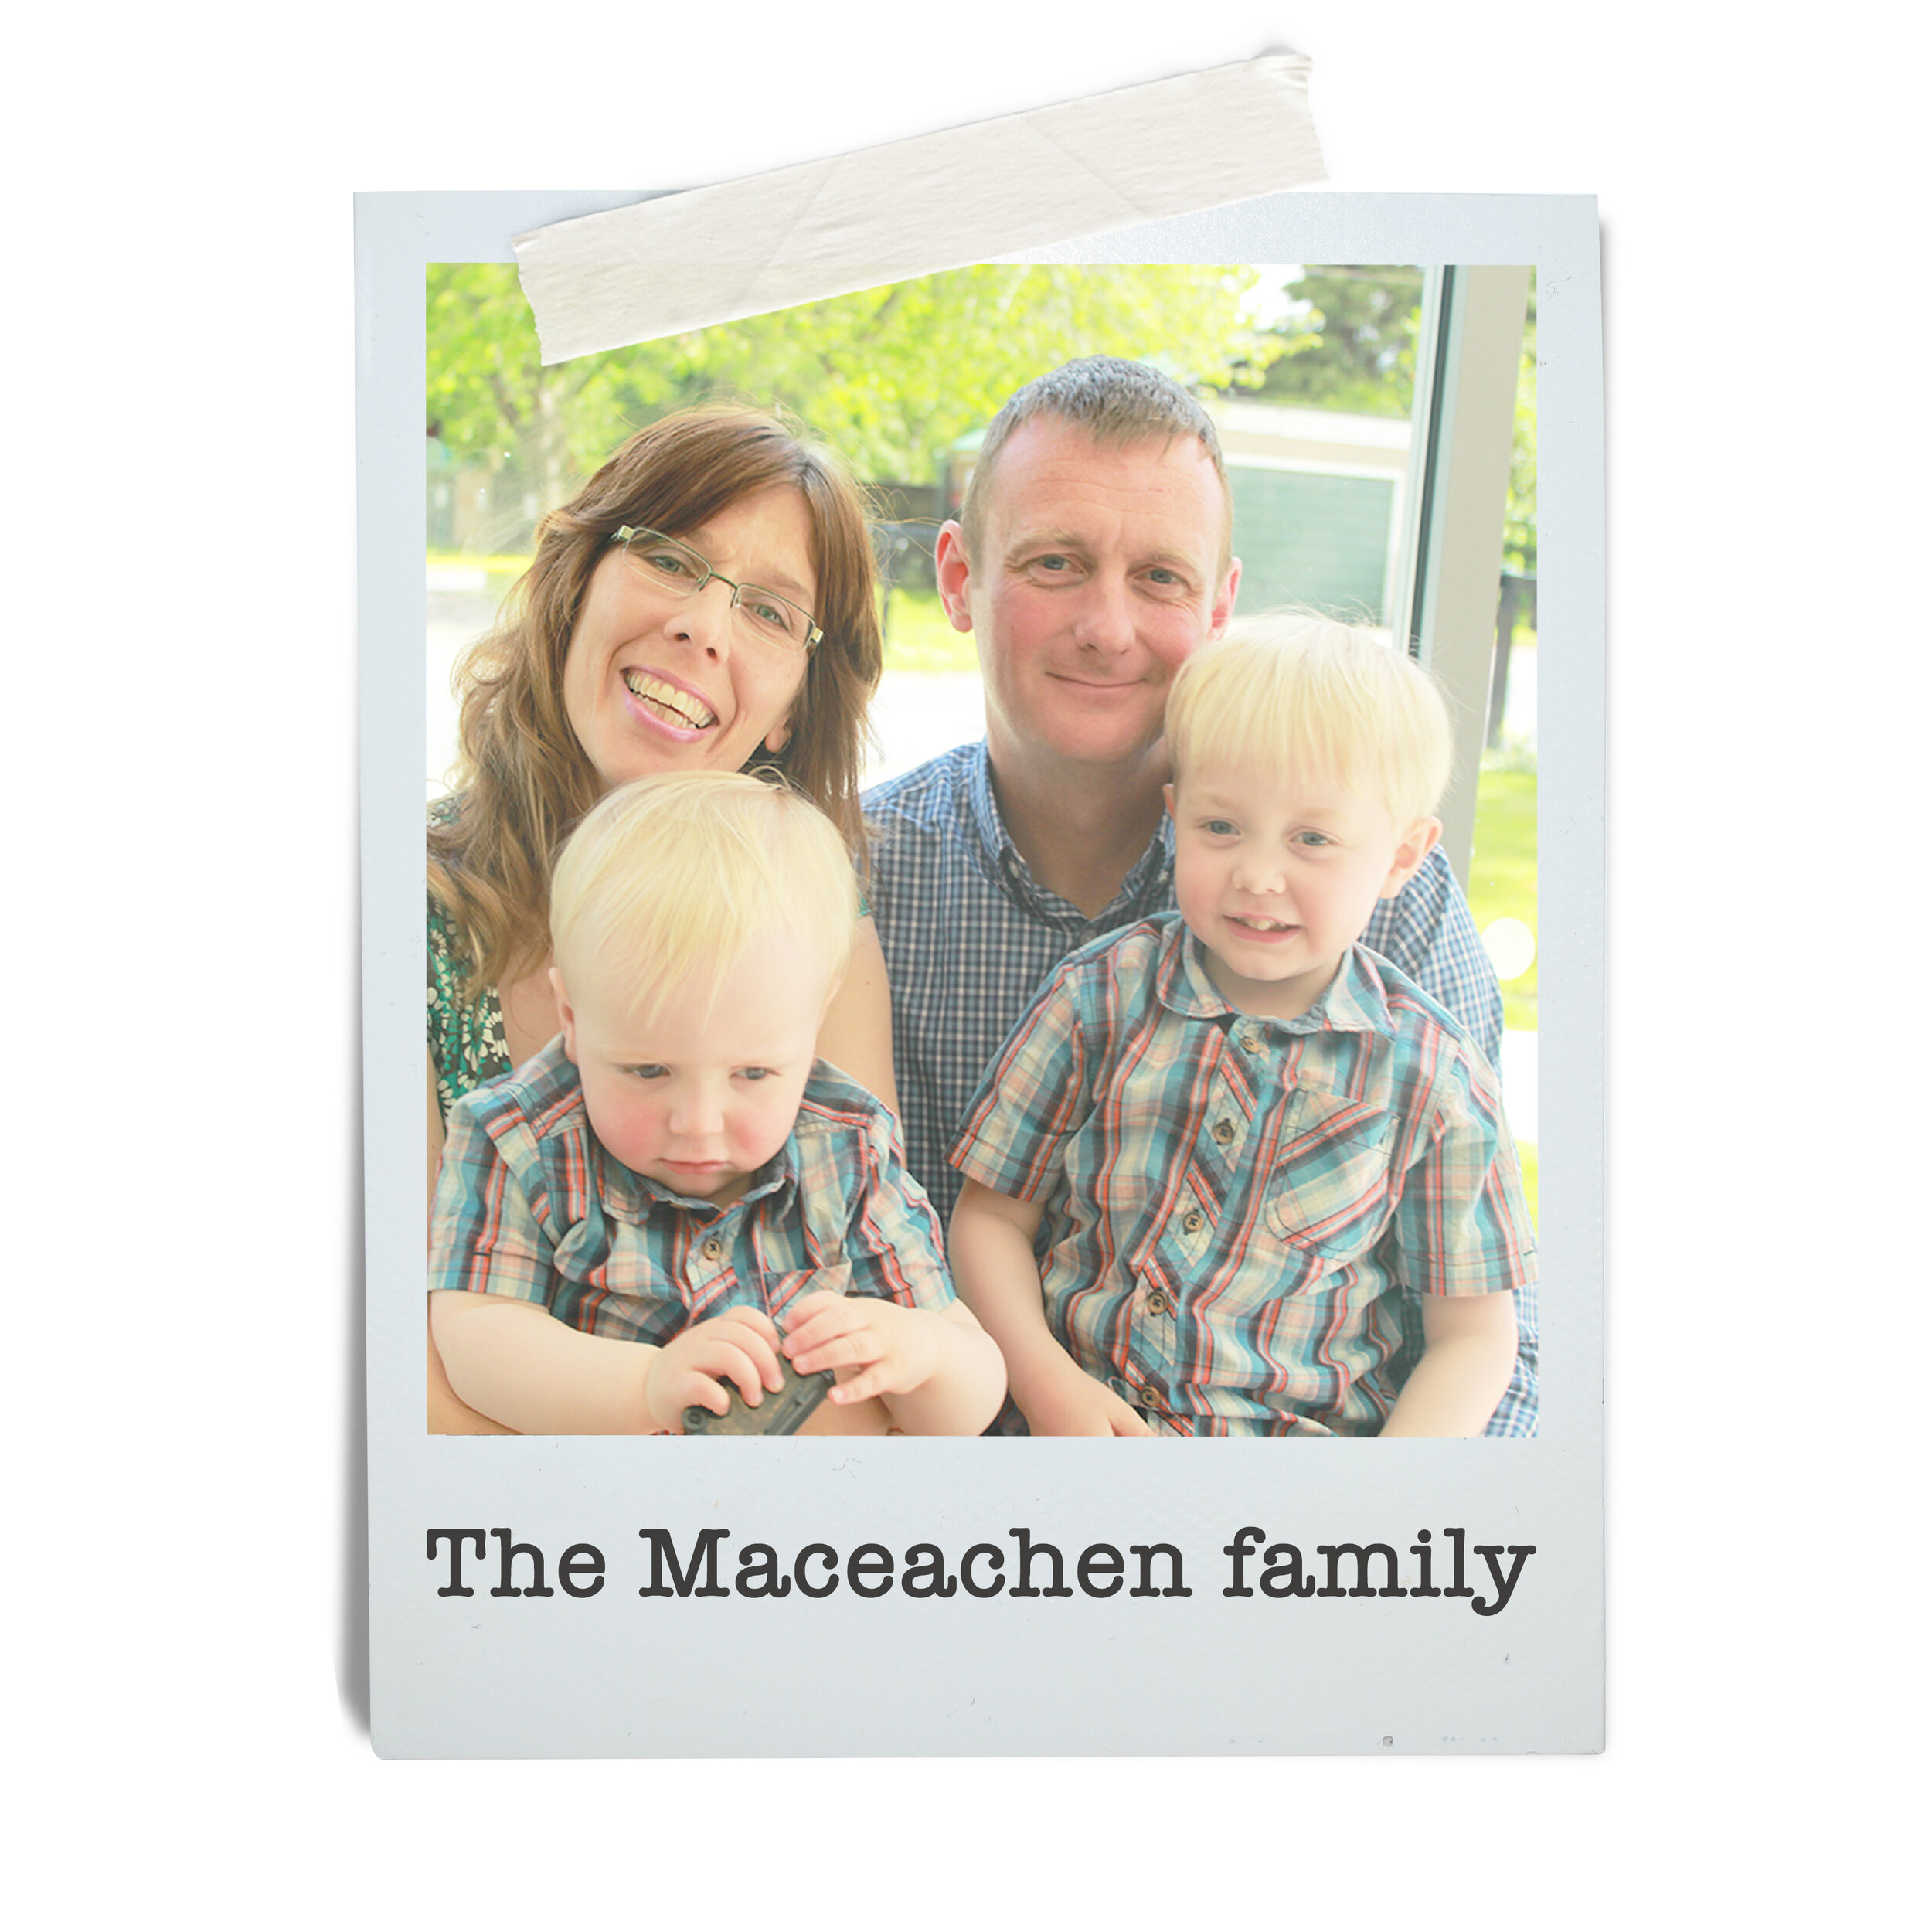 The Maceachen Family